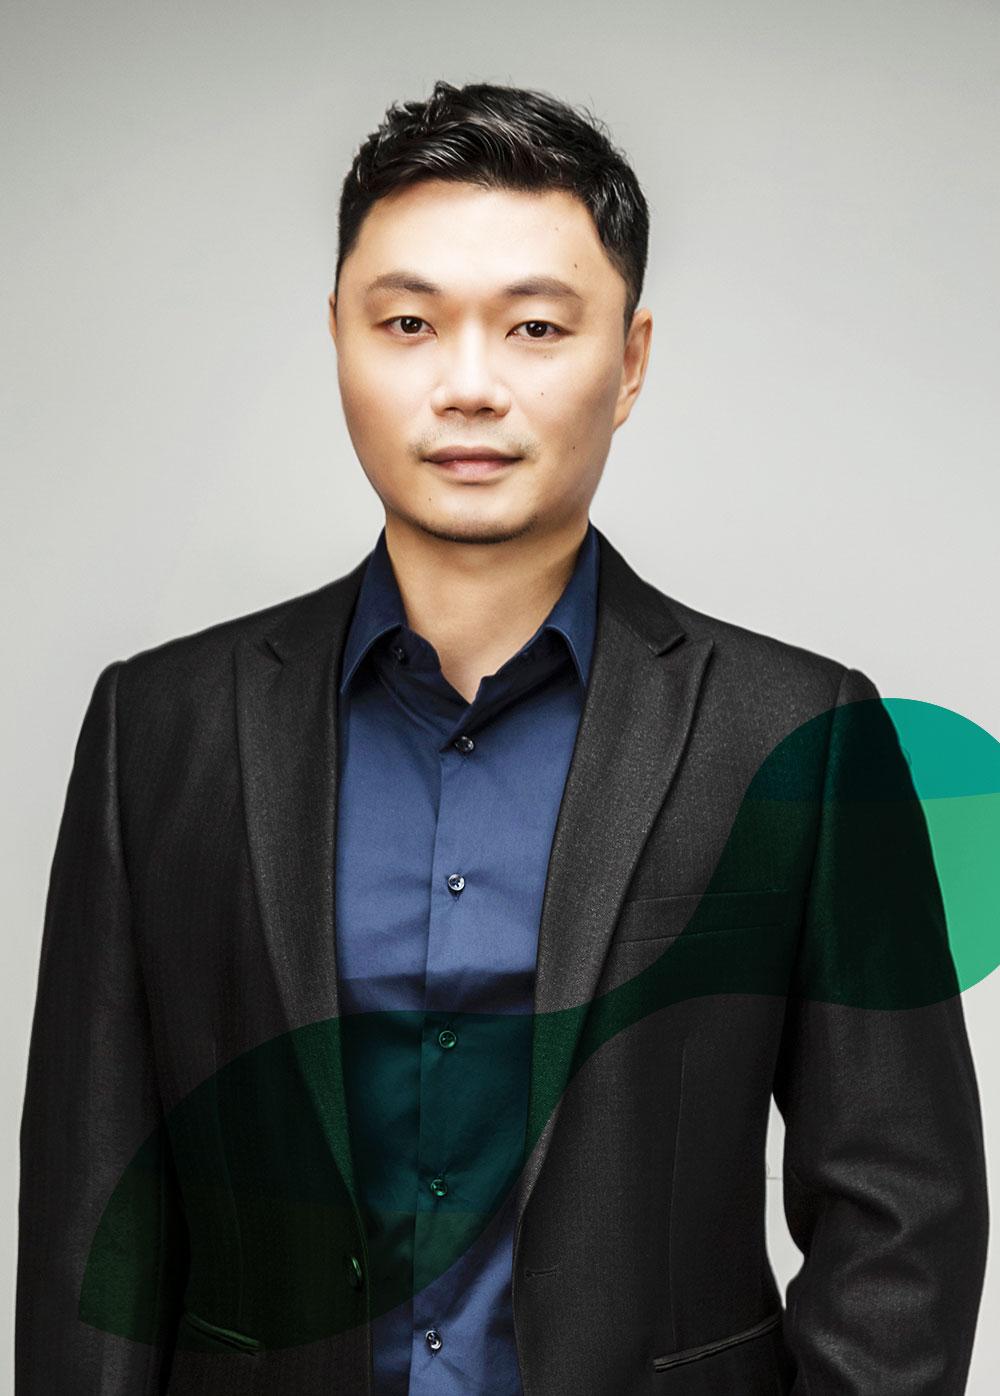 Jerry Qian